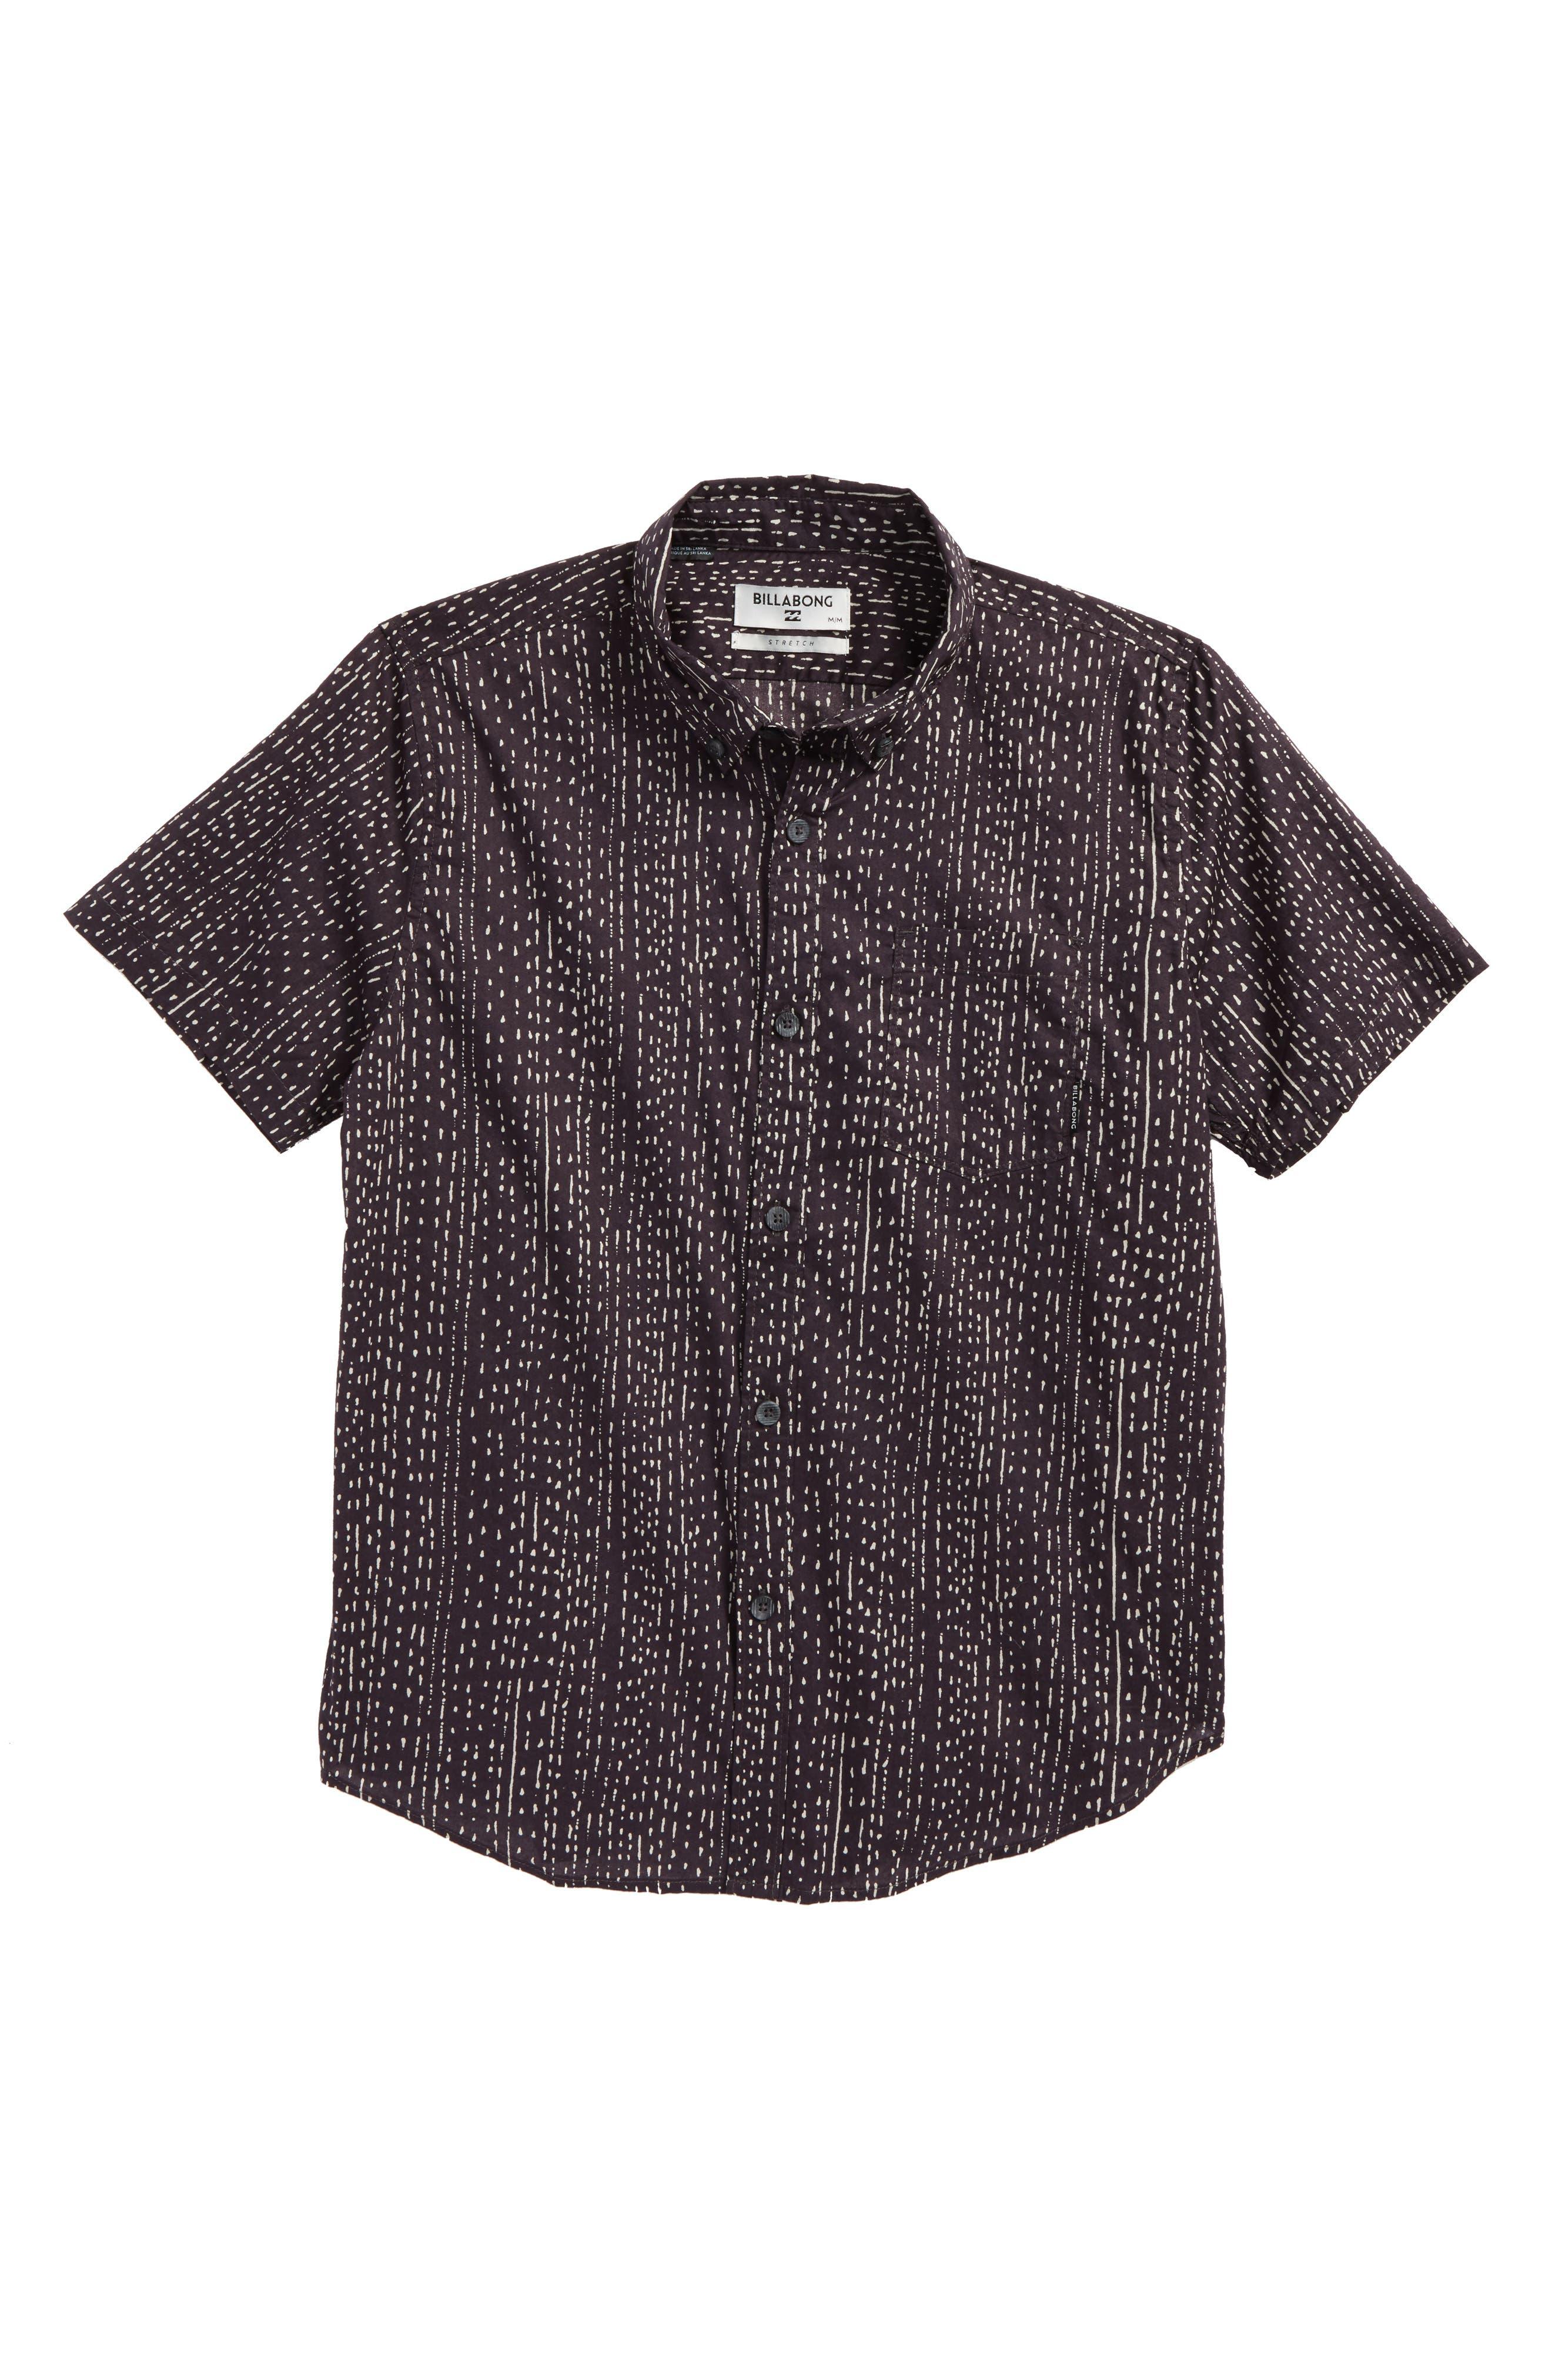 Sundays Mini Short Sleeve Woven Shirt,                             Main thumbnail 1, color,                             020